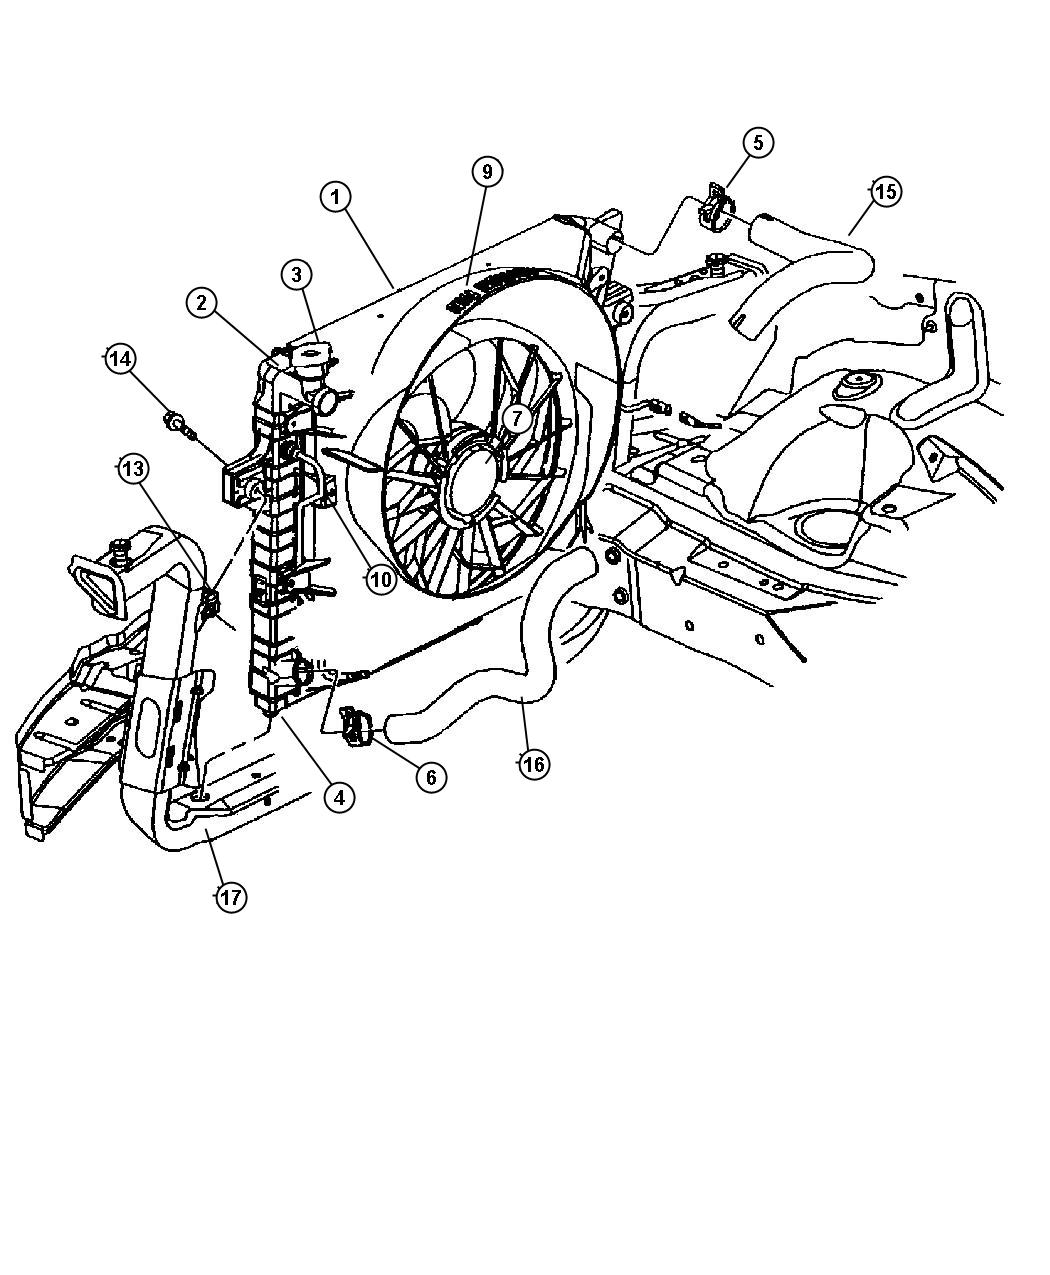 Dodge Ram Hose Radiator Inlet